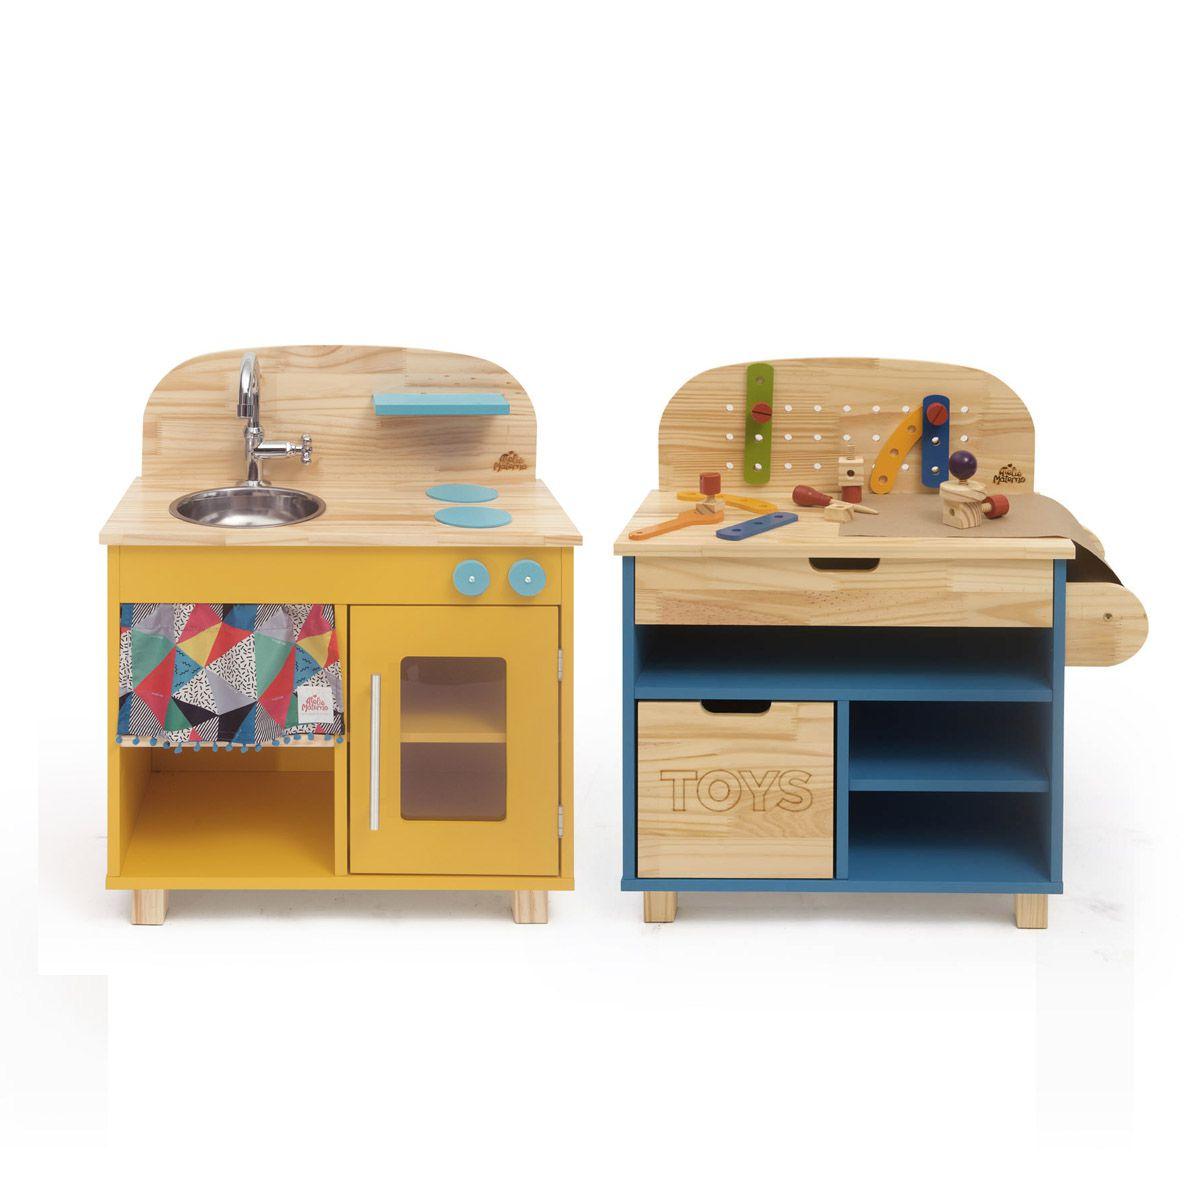 Kit Mini Cozinha Amarela + Oficina Azul | Ateliê Materno